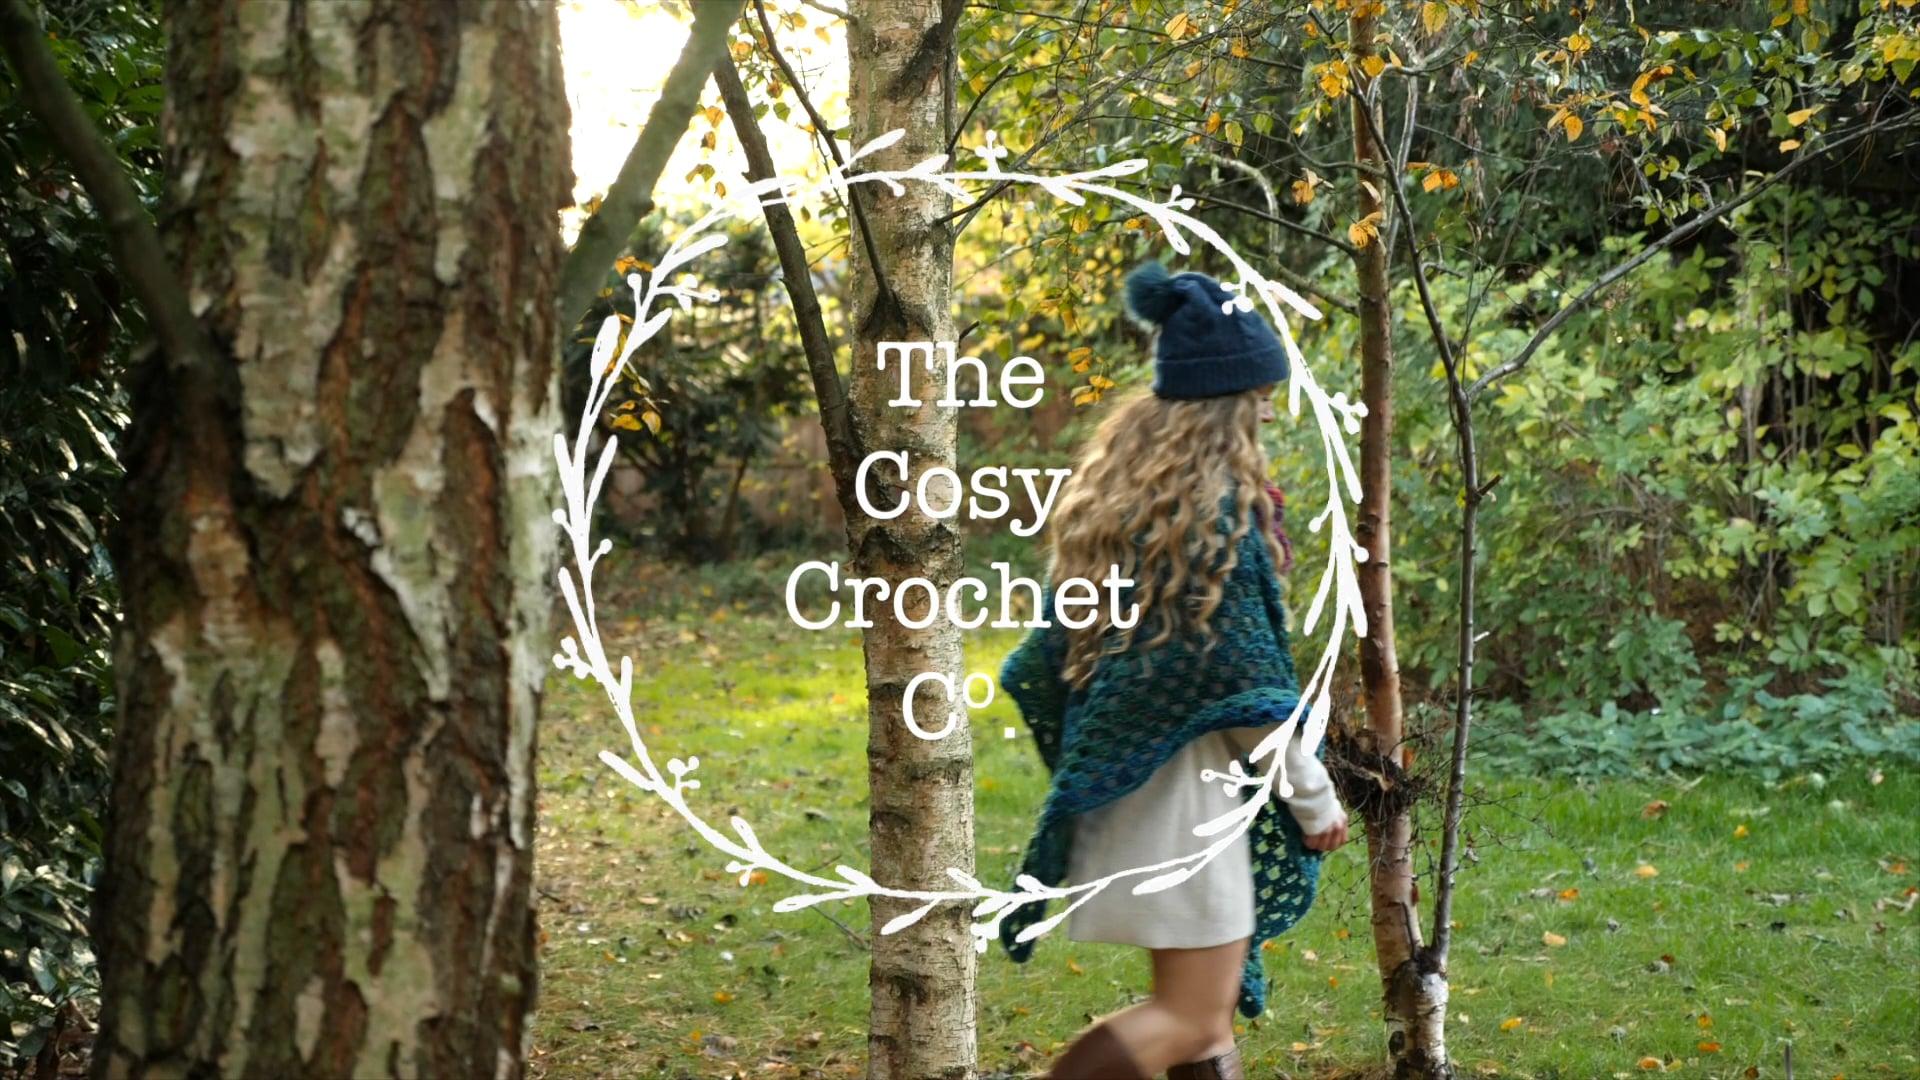 The Cosy Crochet Company HR